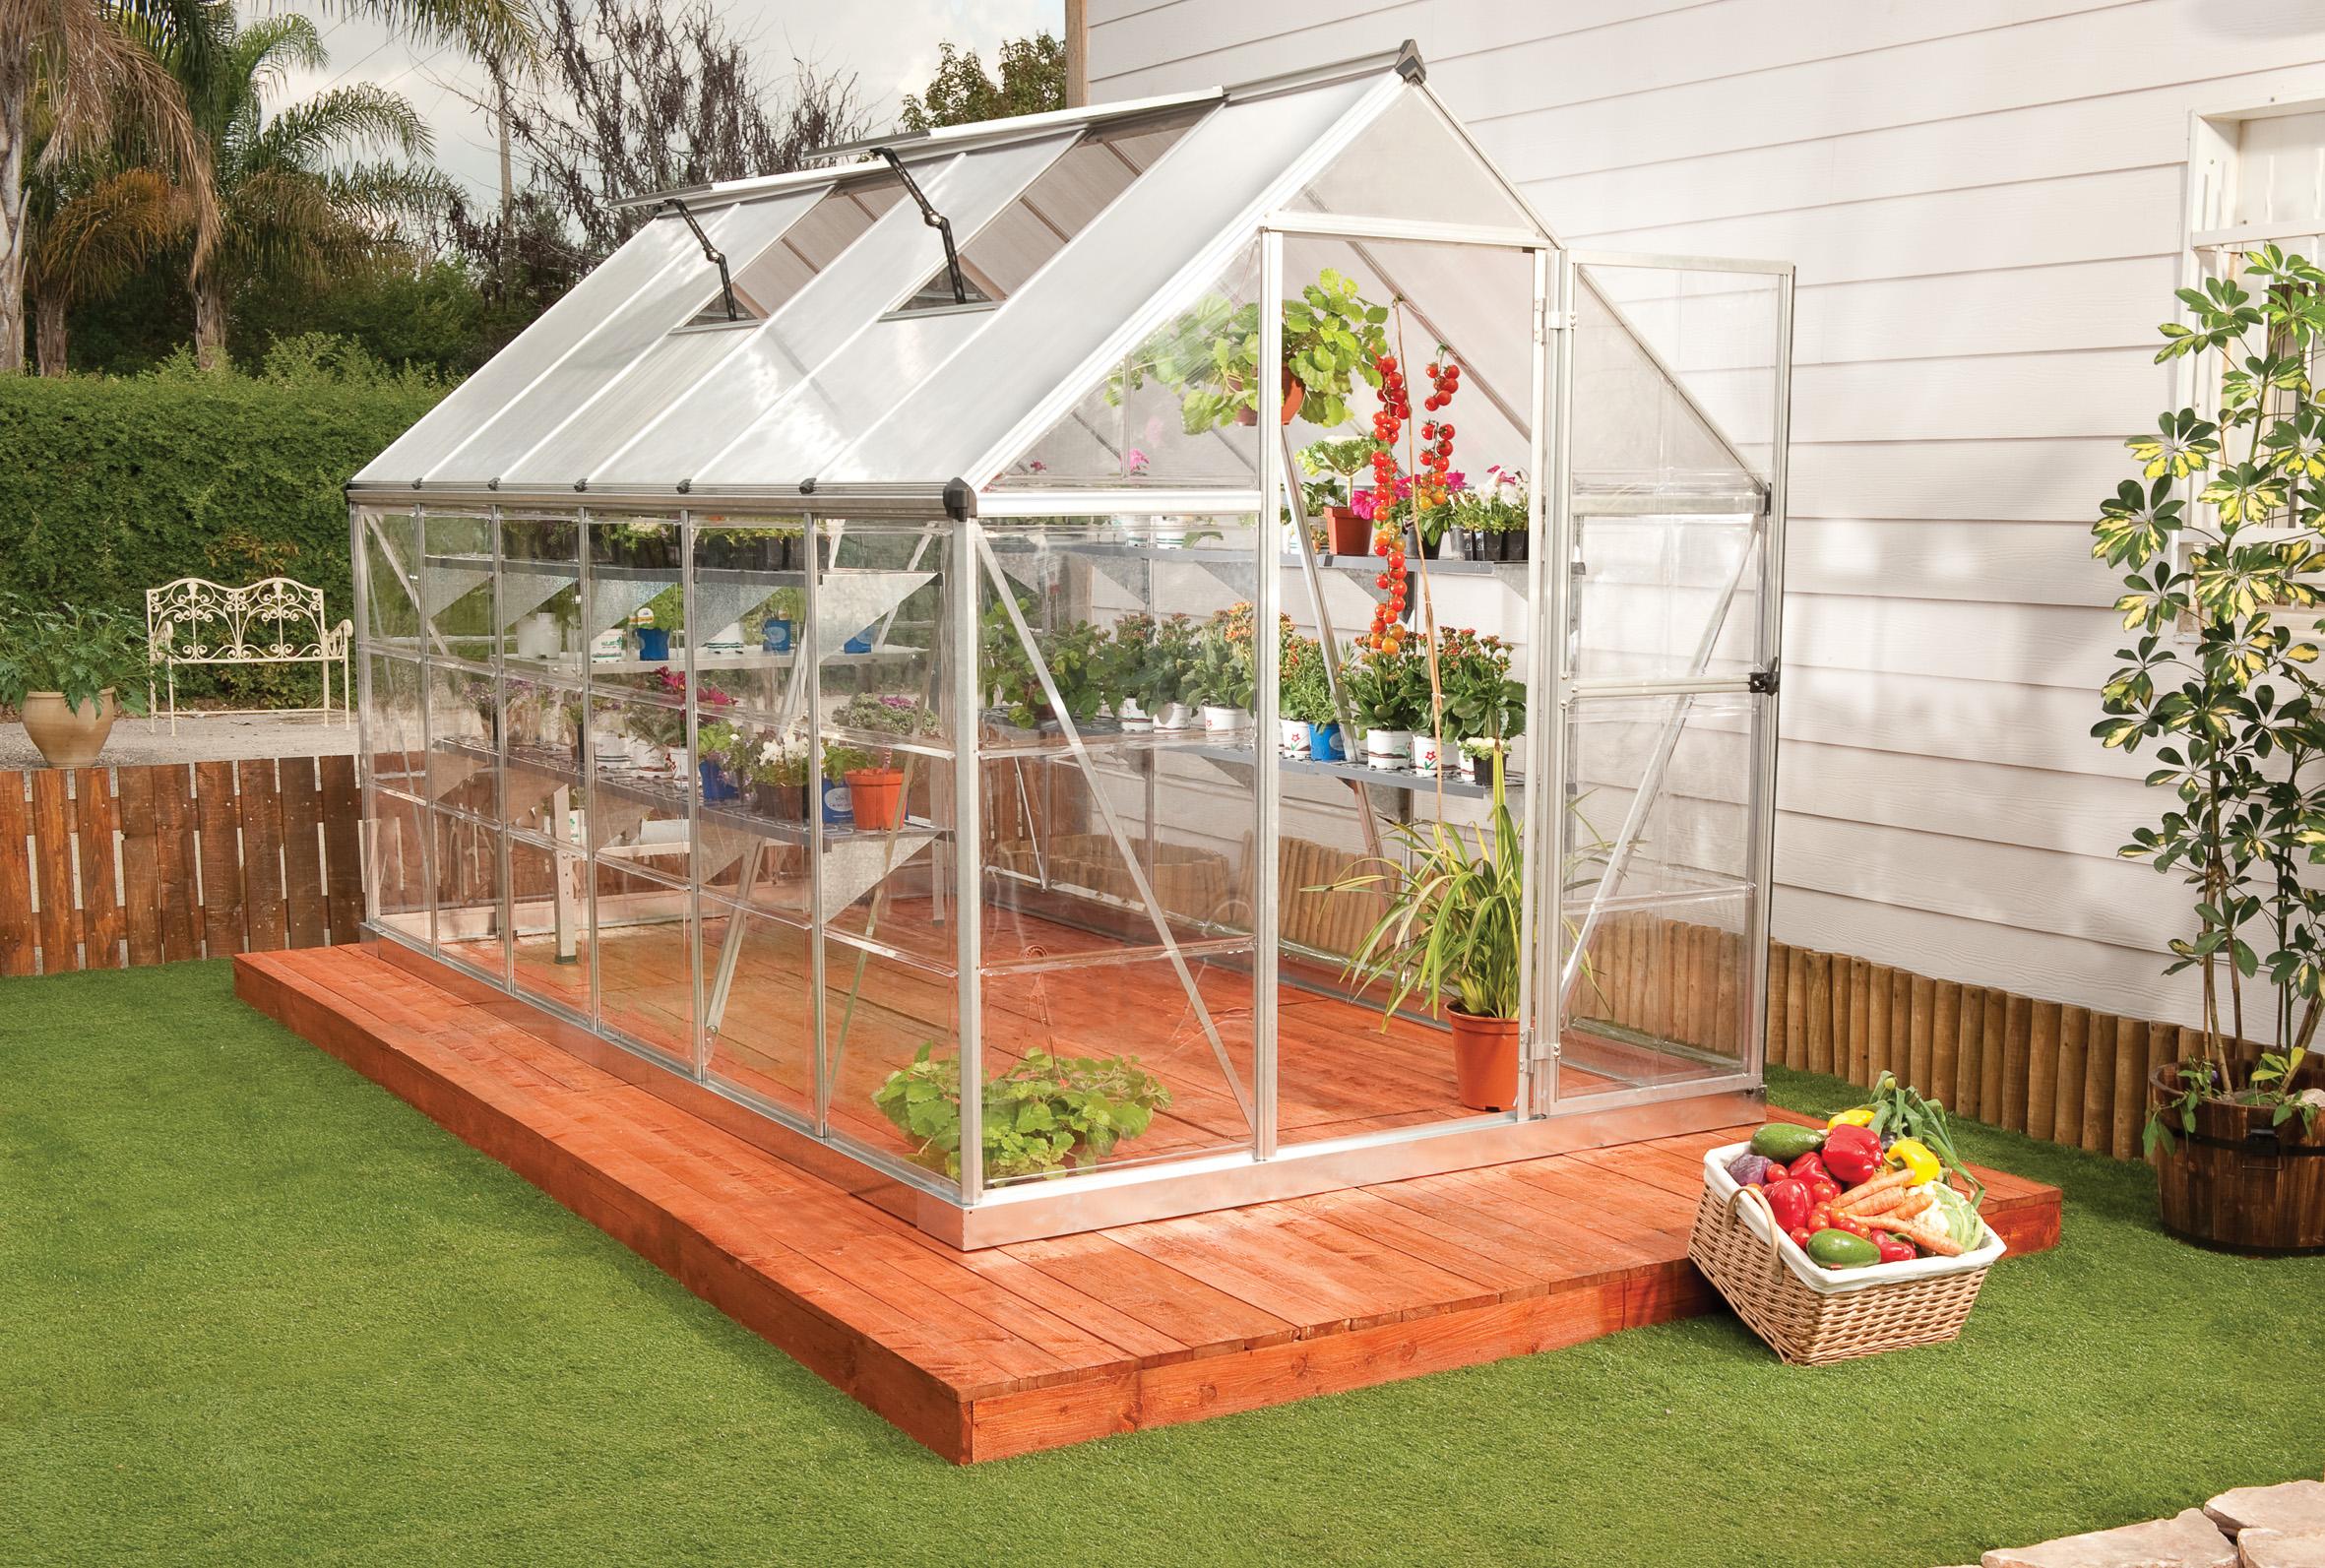 polykarbonátový skleník Palram hybrid 6x12 + ZDARMA základna skleníku + ZDARMA automatický otvírač oken + ZDARMA sada 10ti háčků pro rostliny + hnojivo Biocin-FF + prodloužená ZÁRUKA 10 LET